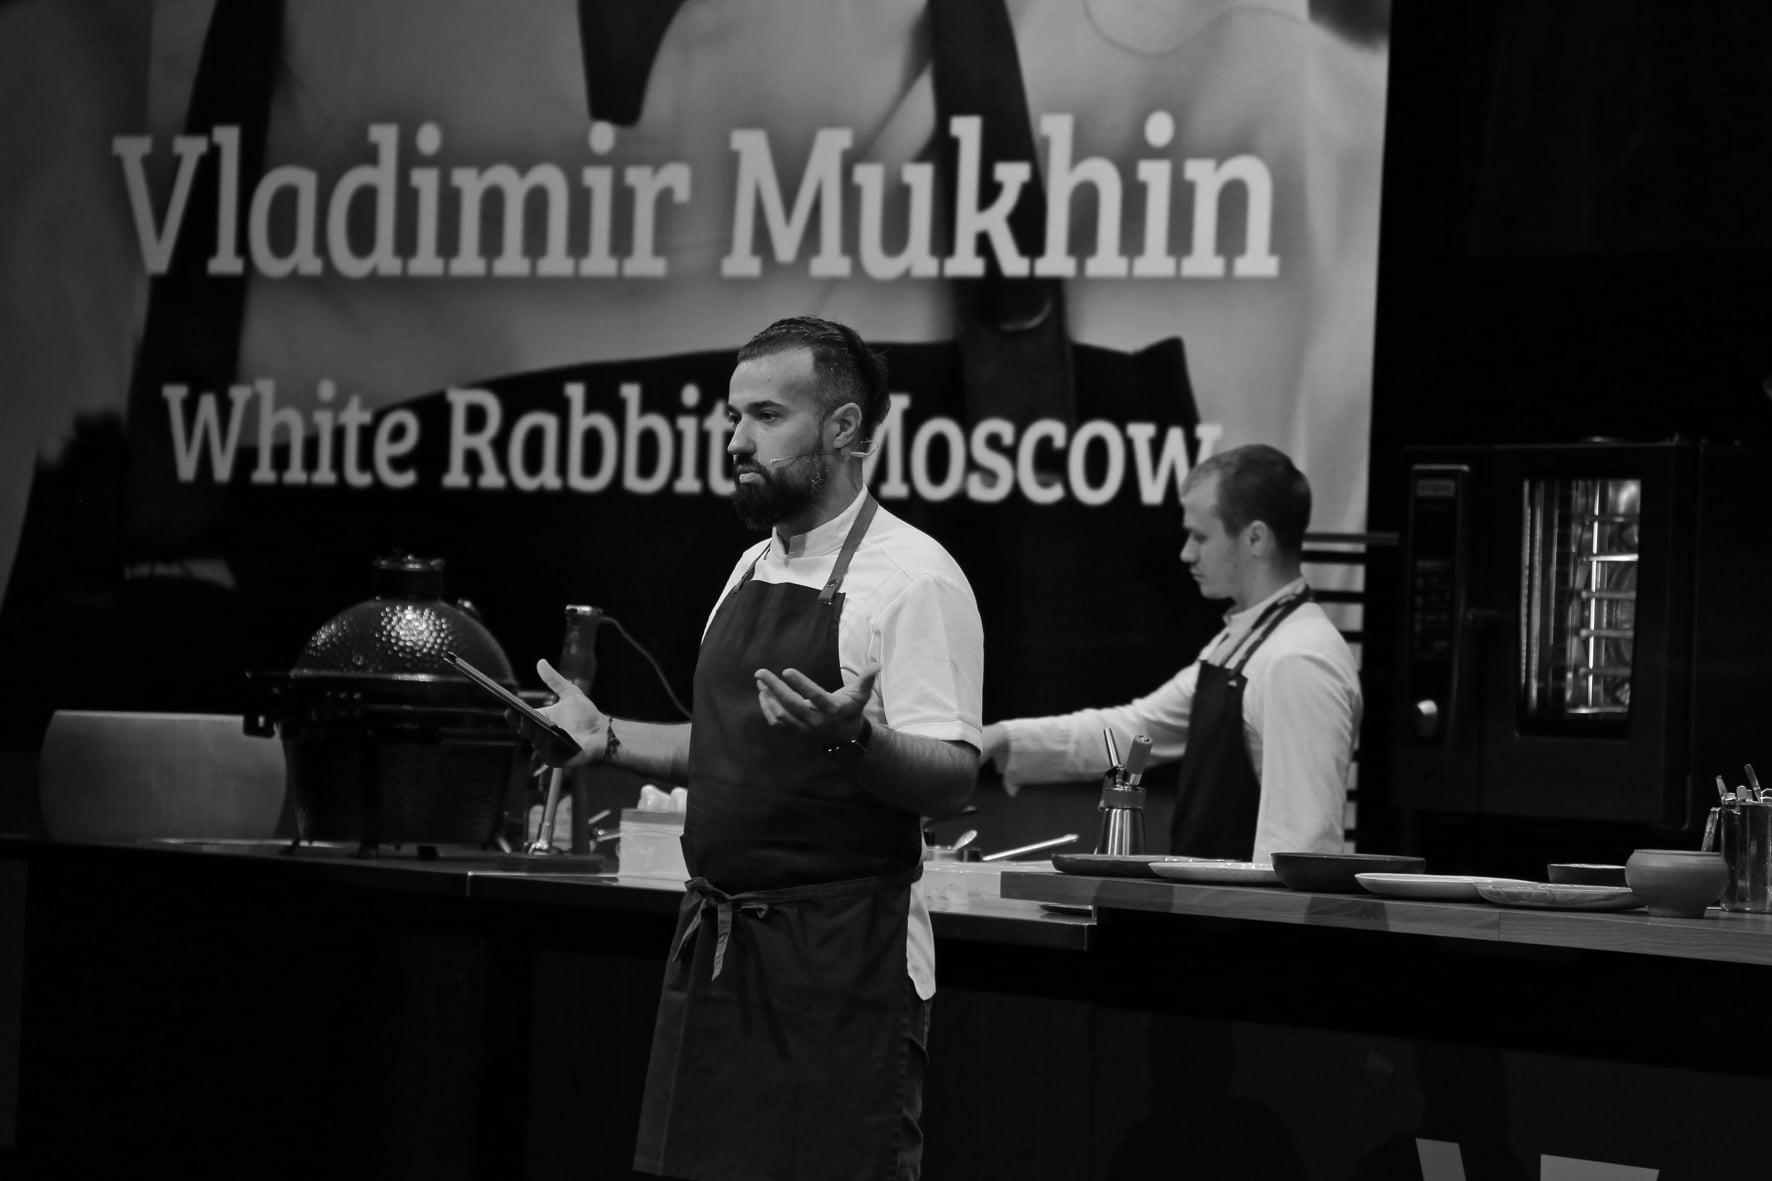 Vladimir Mukhin | Foto: Thomas Ruhl